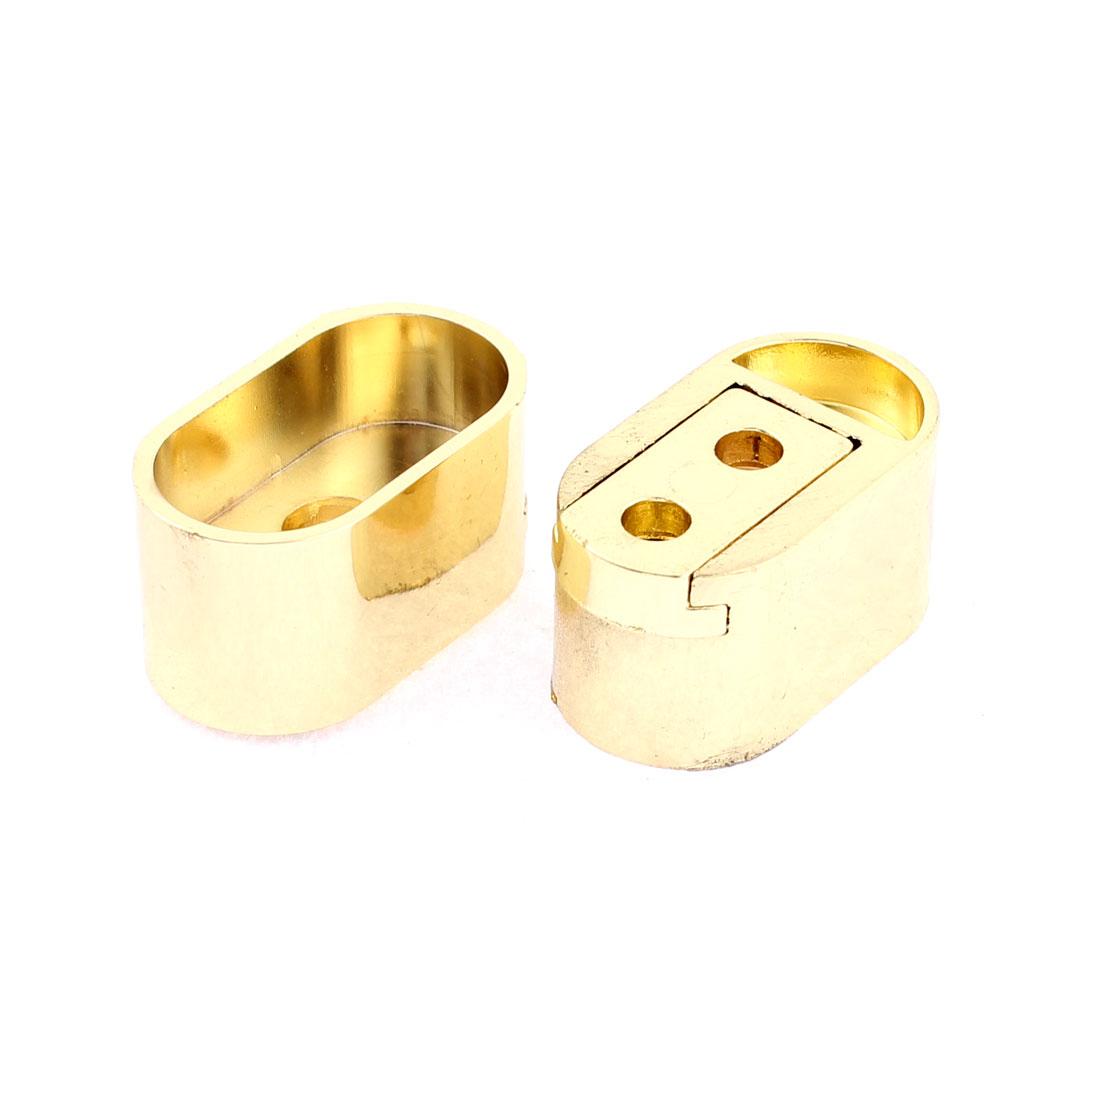 Clothes Closet Rod Flange Holder Bracket Gold Tone 2Pcs